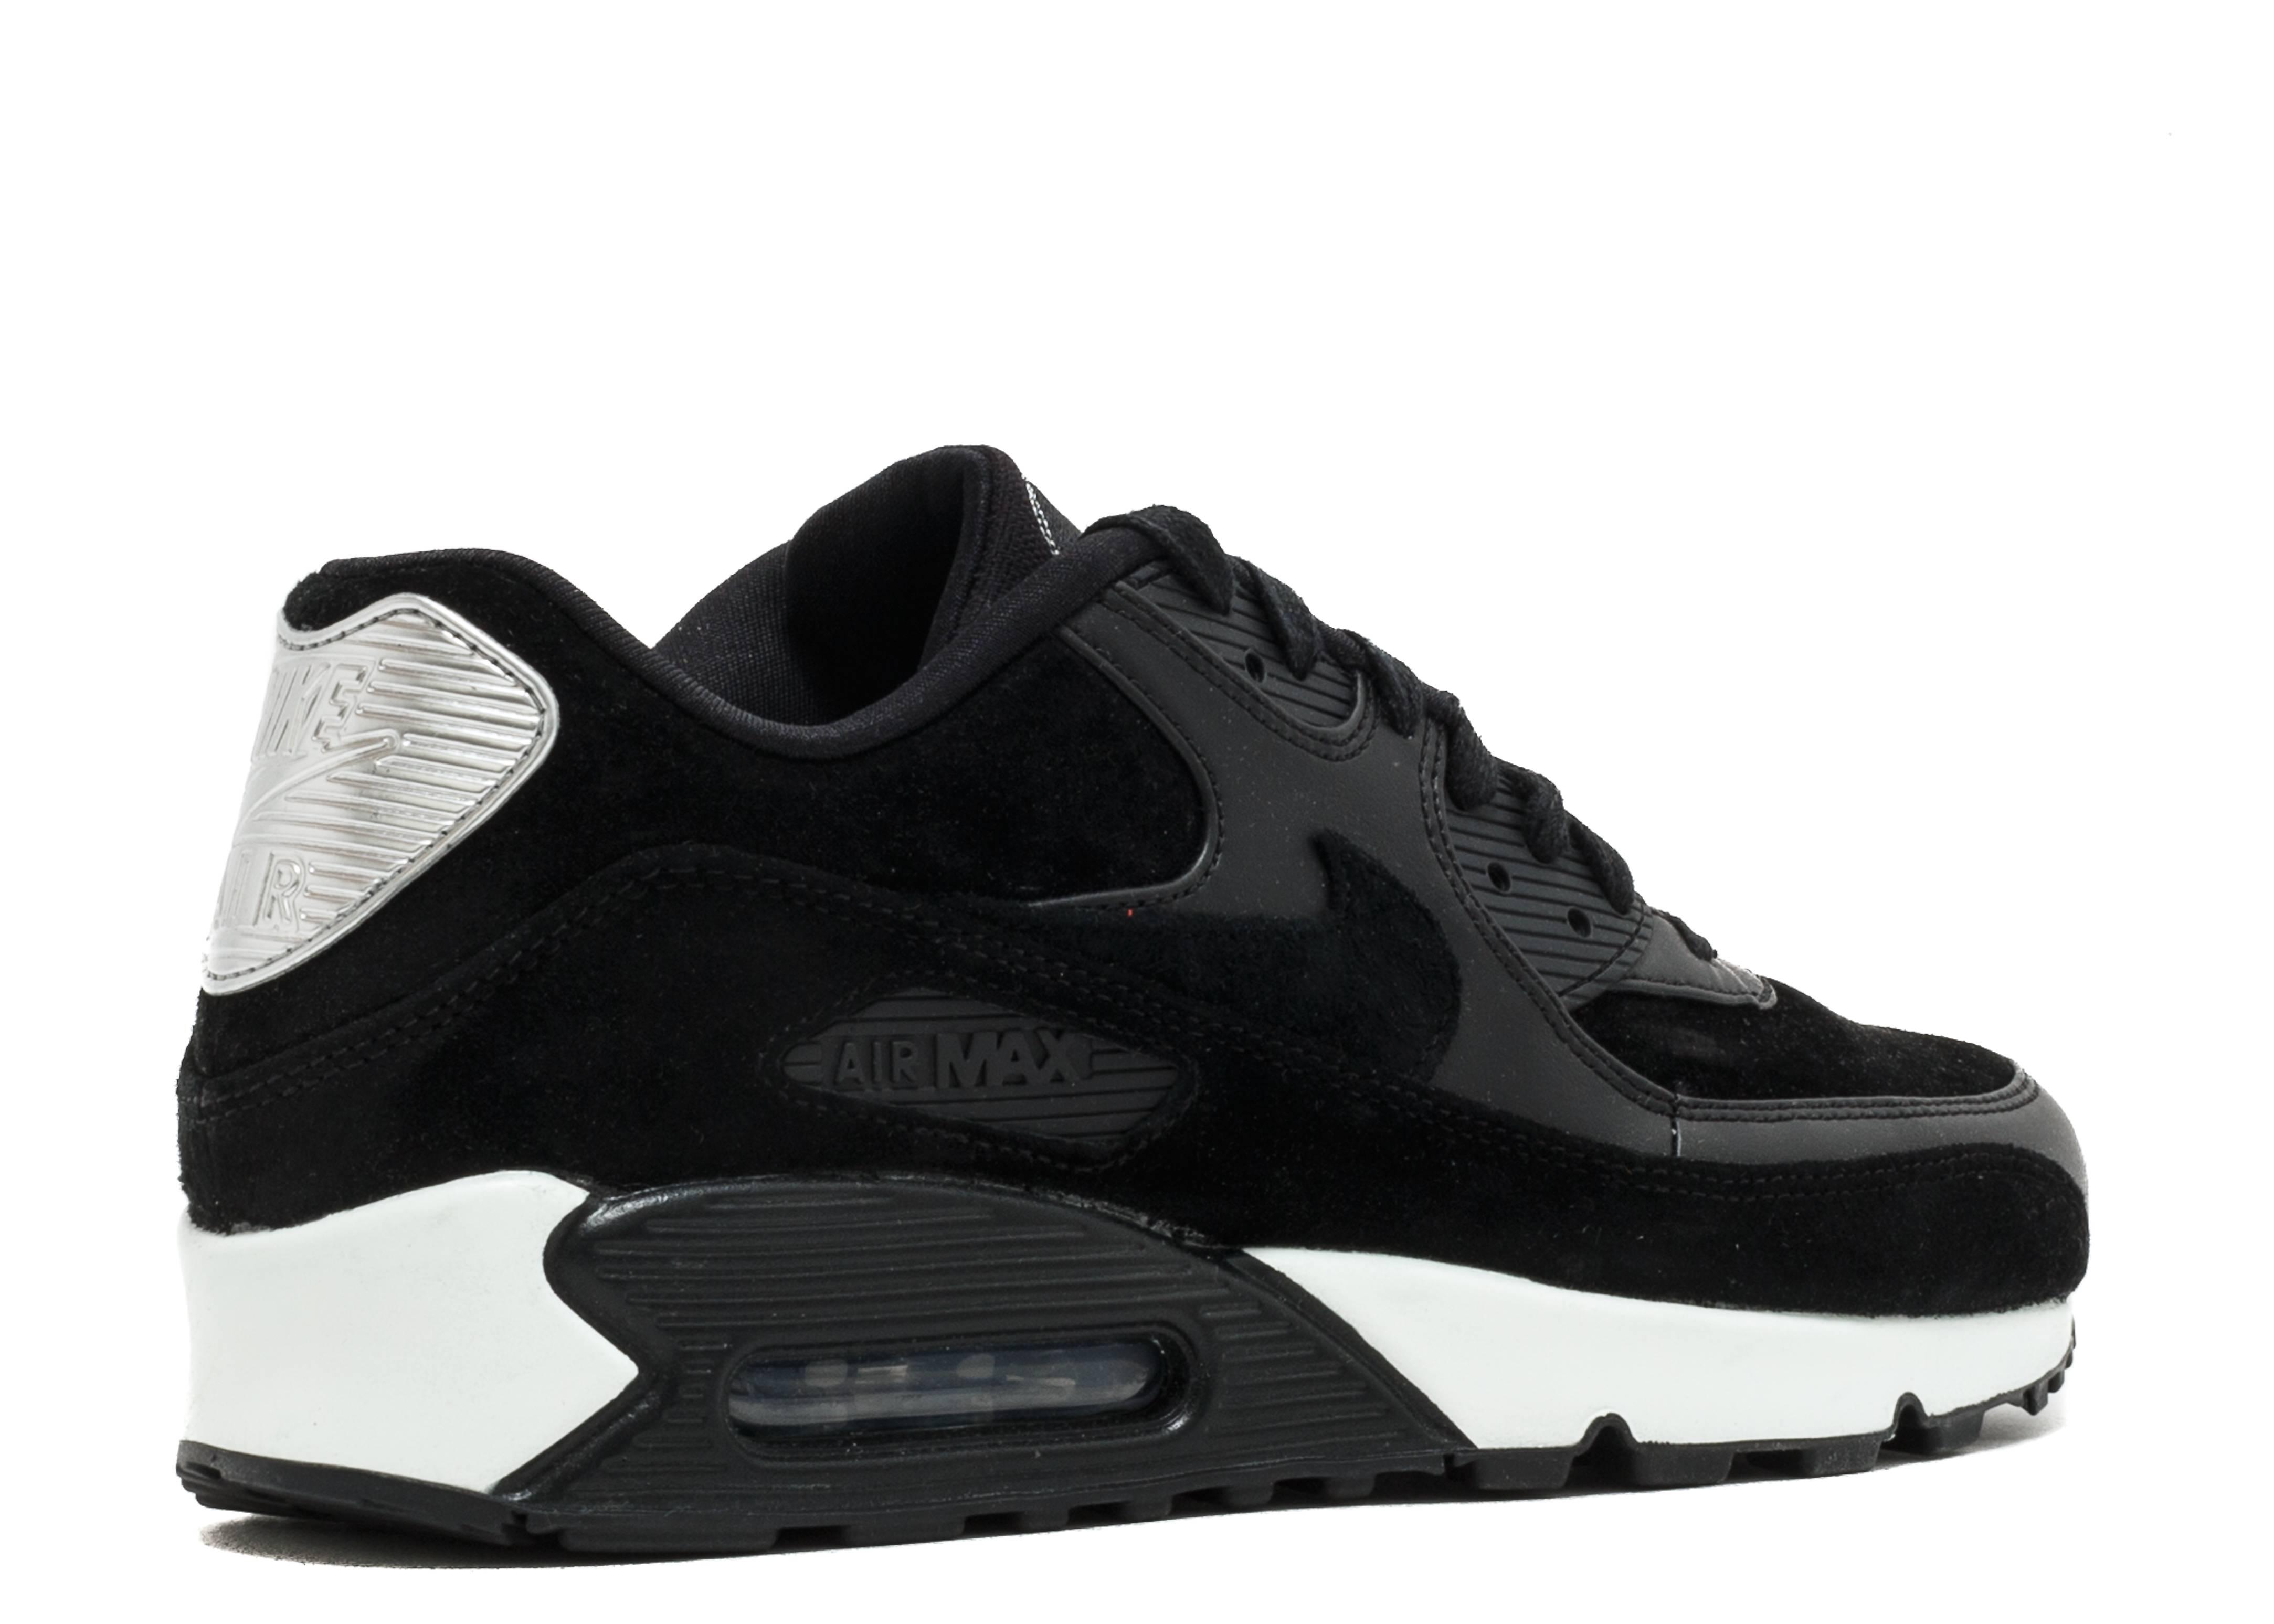 Escabullirse Soberano límite  Air Max 90 Premium 'Rebel Skulls' - Nike - 700155 009 - black/chrome-off  white | Flight Club